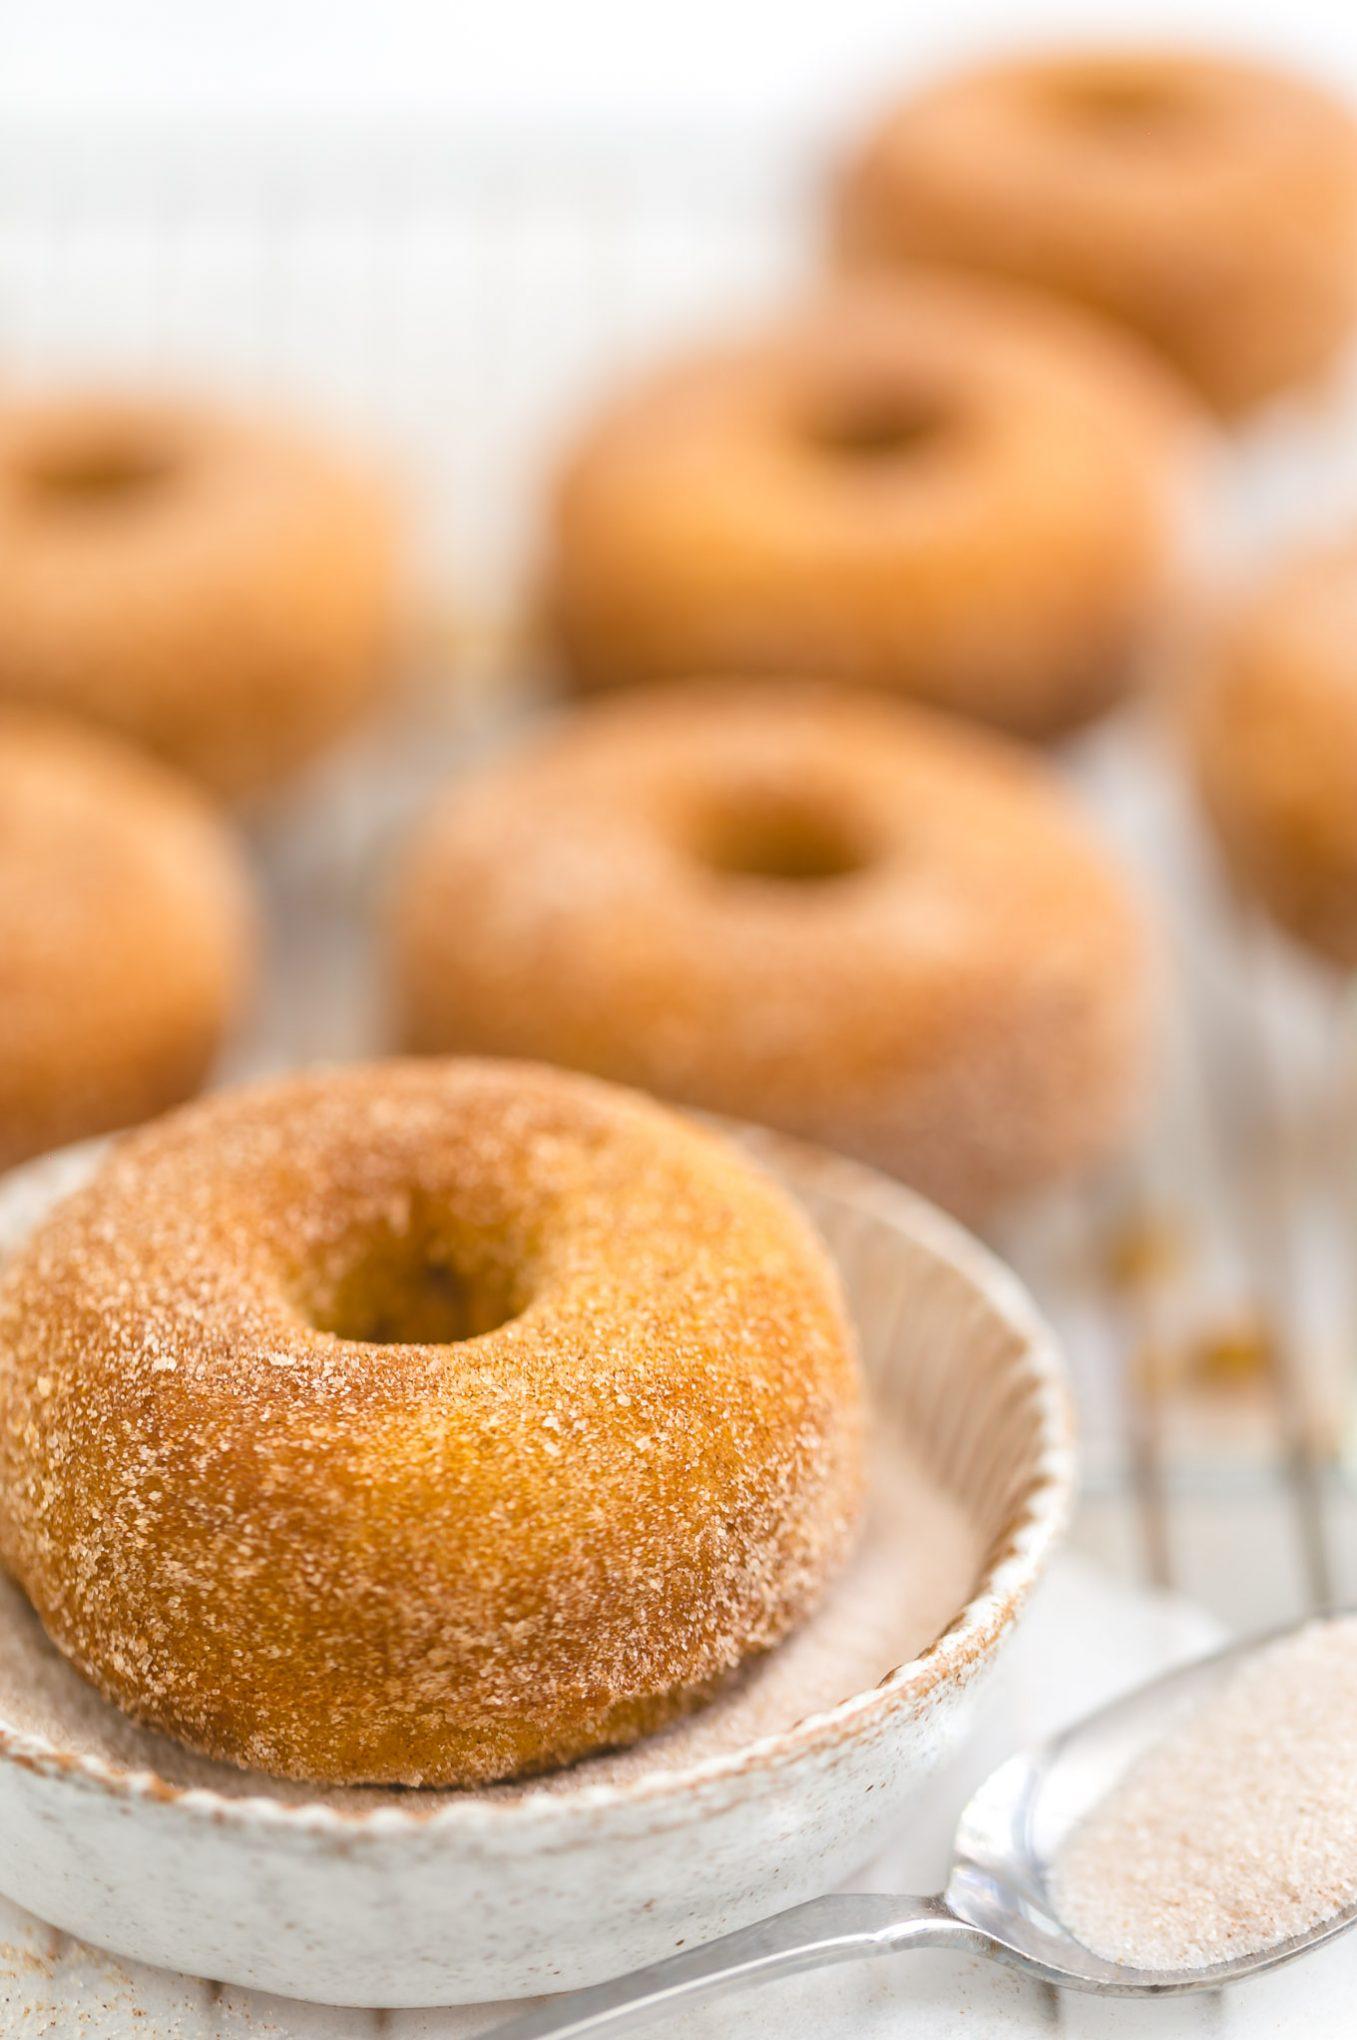 cinnamon sugar coating for donuts